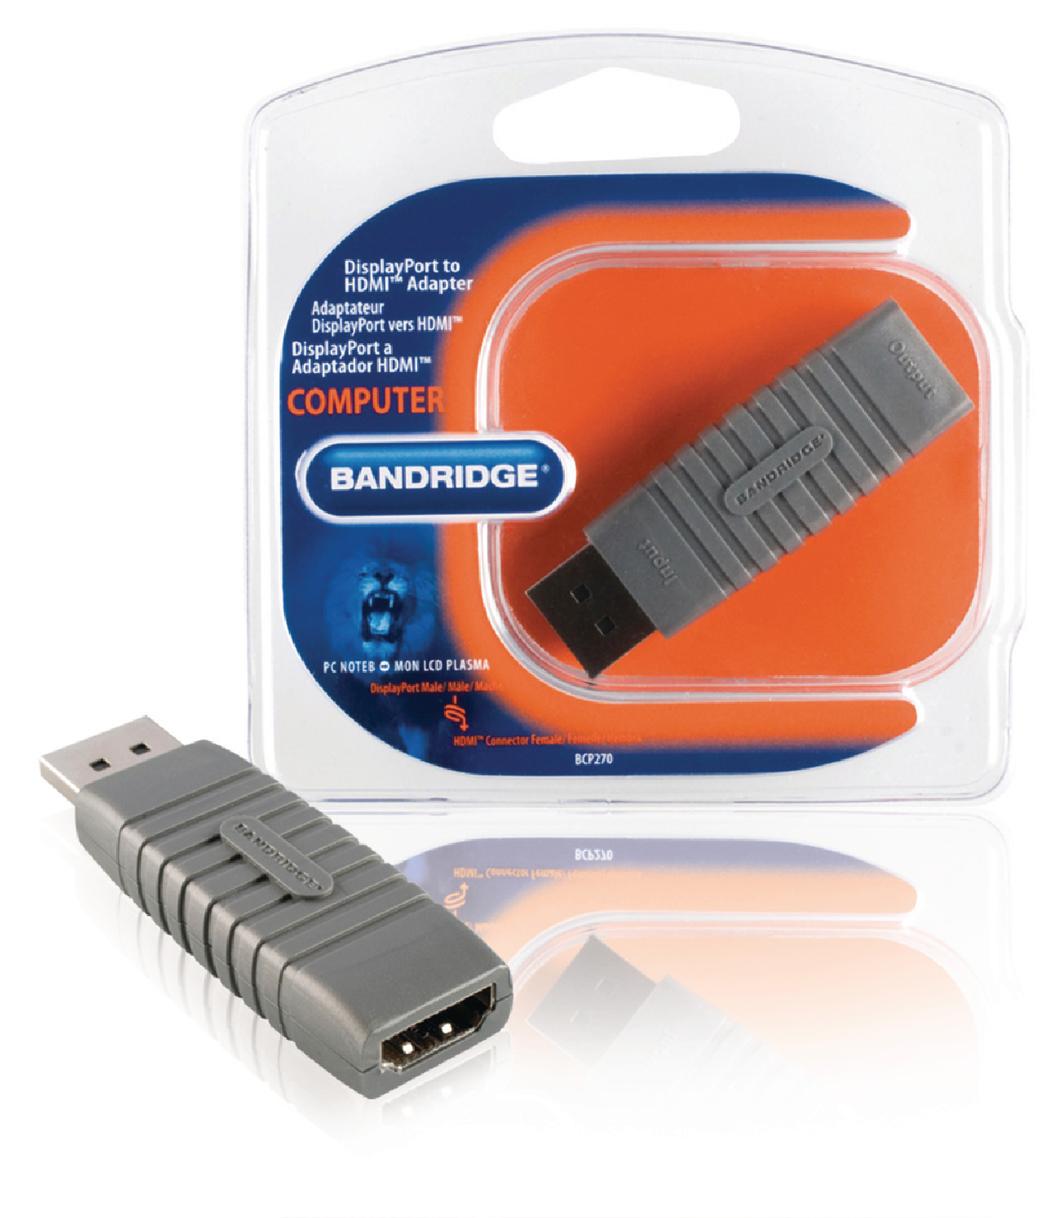 Bandridge BCP270 Displayport HDMI F adapter